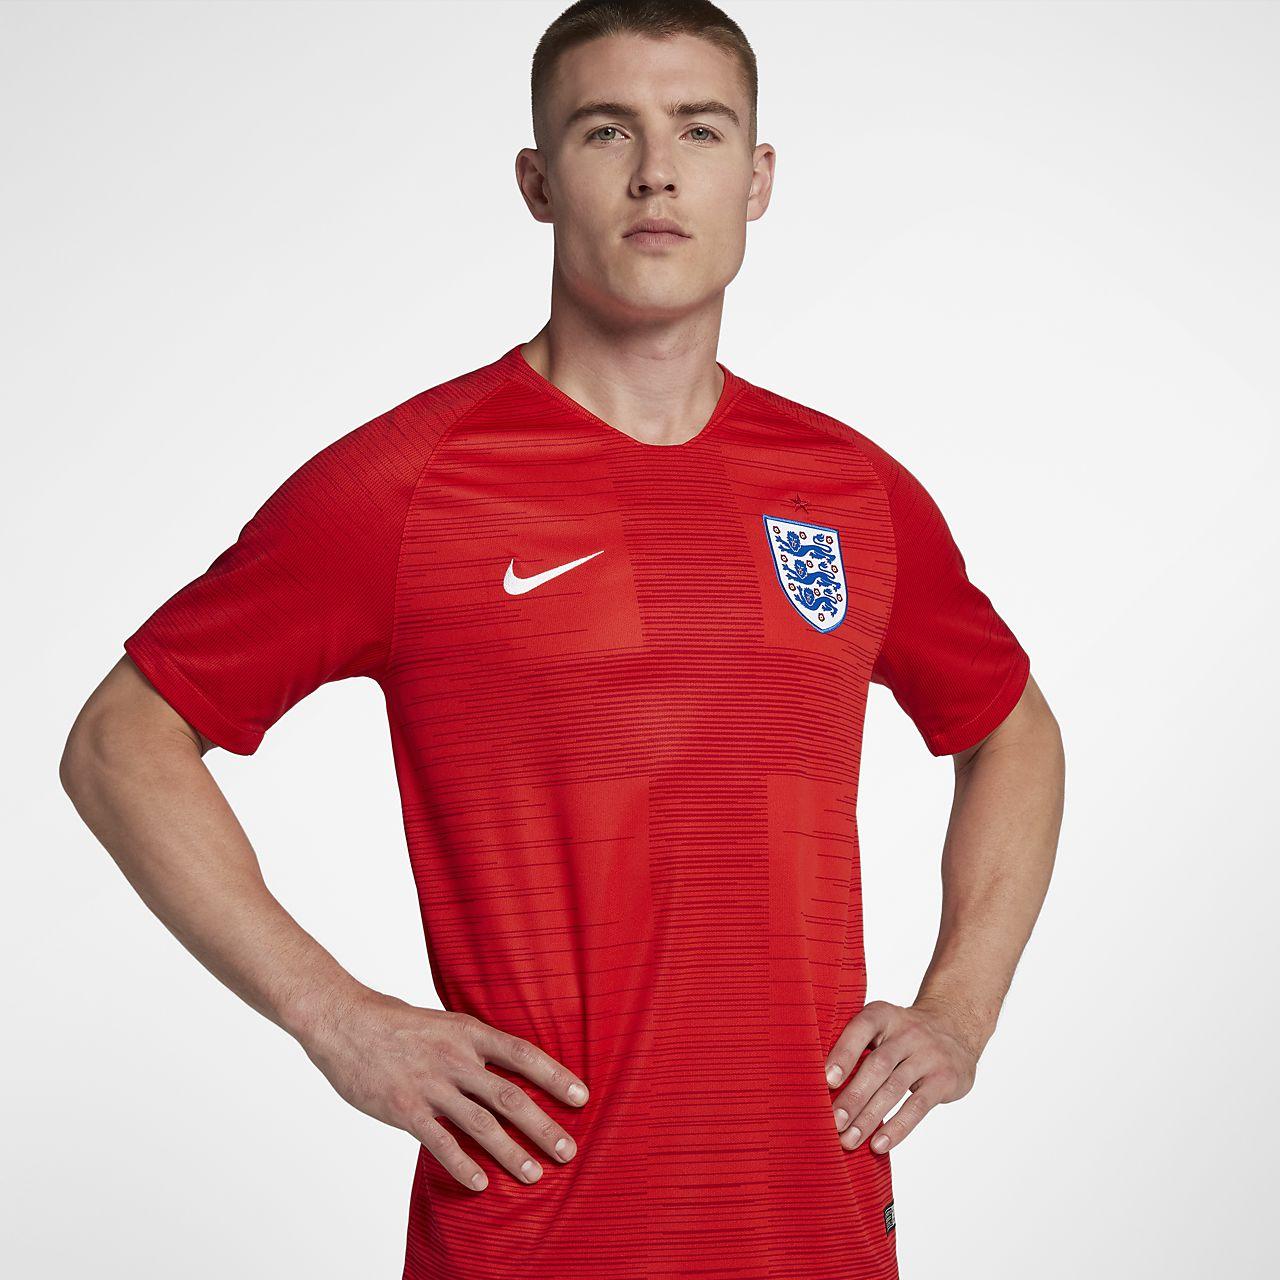 Ch Maillot Homme England Pour Football Away 2018 Stadium De 4Wgnqw4r8